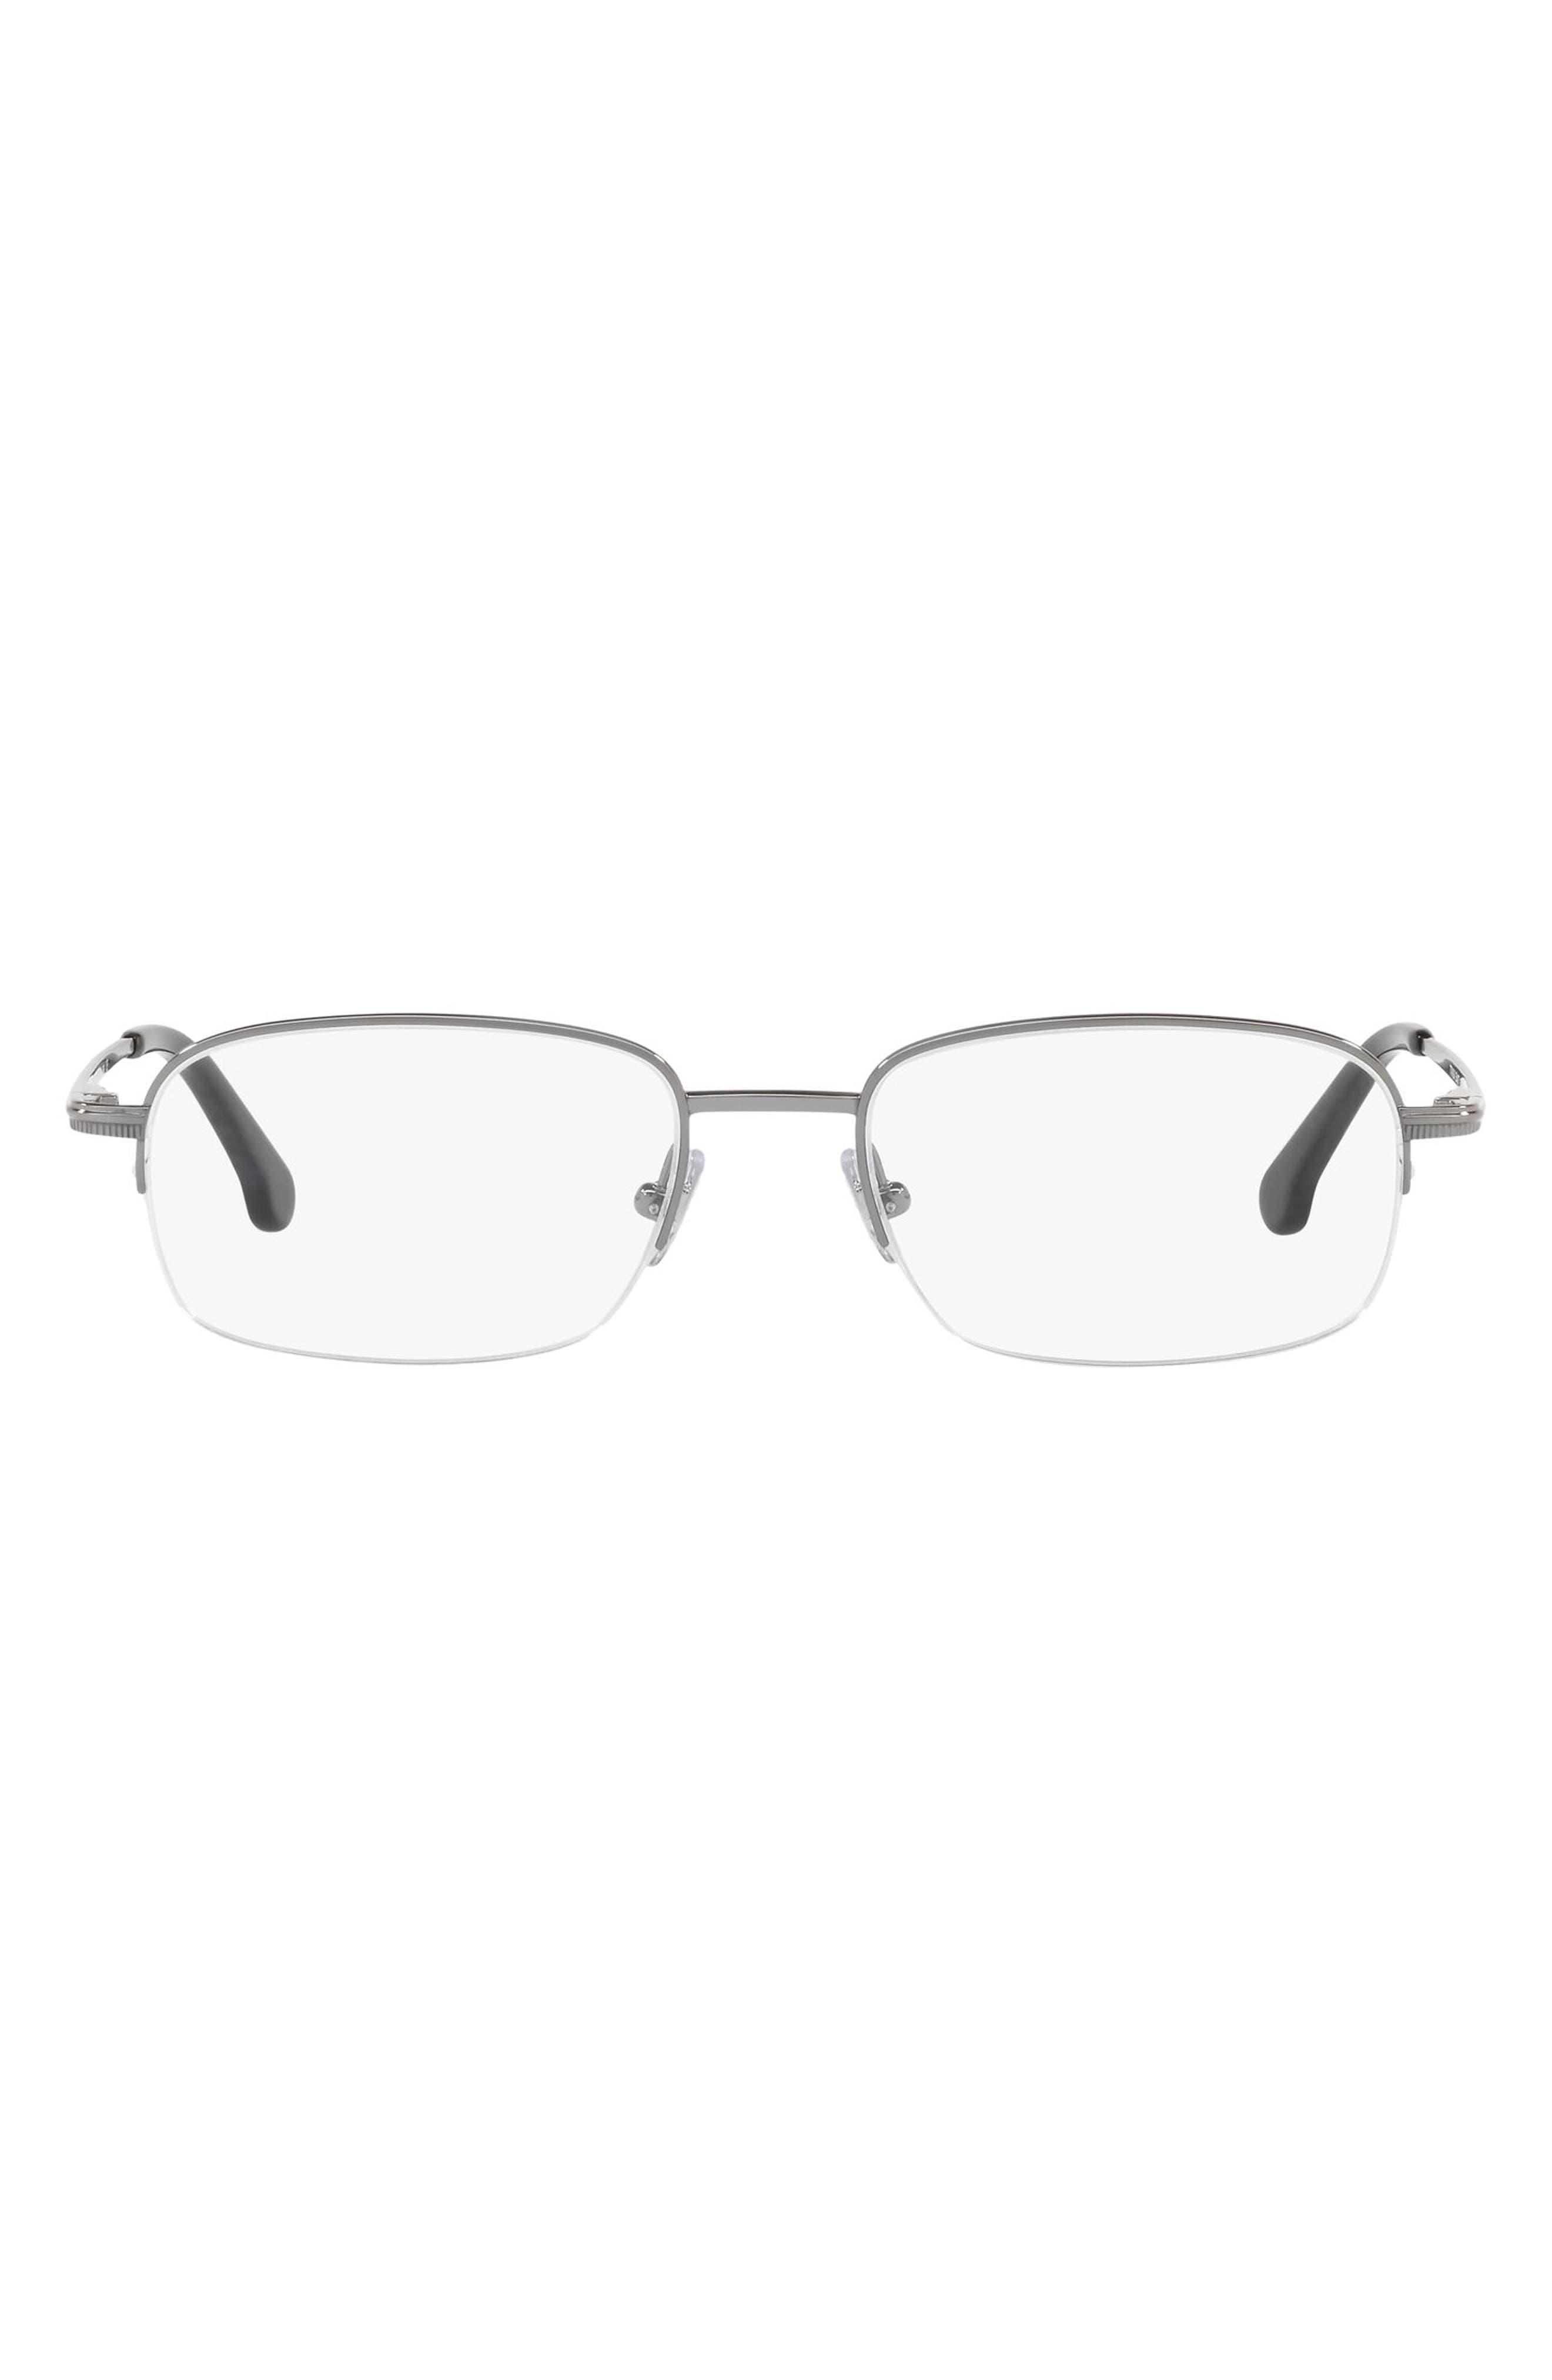 52mm Rectangular Optical Glasses